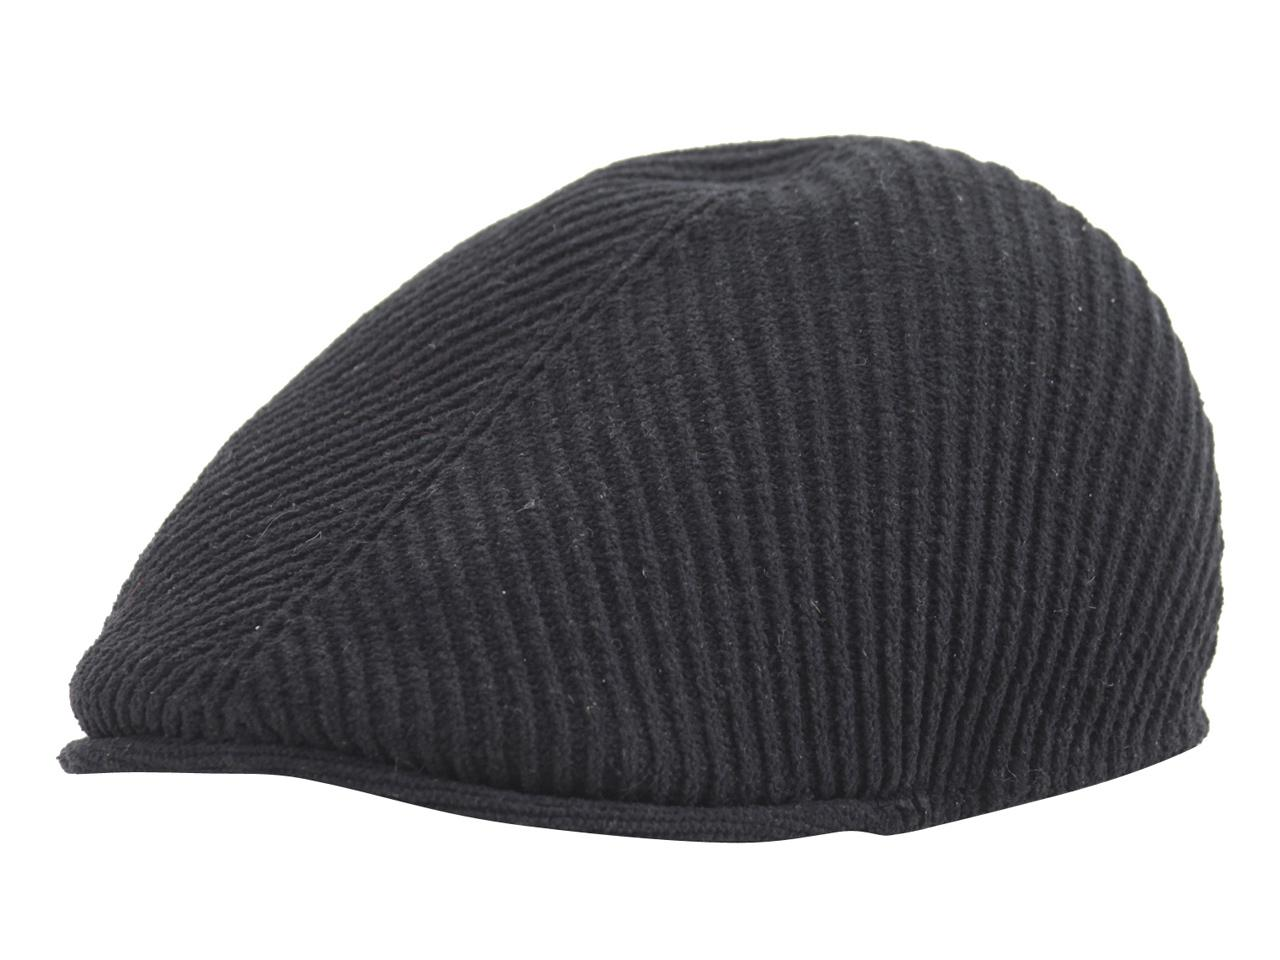 abb463d1a9b047 Kangol Men's Cord Rib 507 Flat Cap Hat by Kangol. 12345